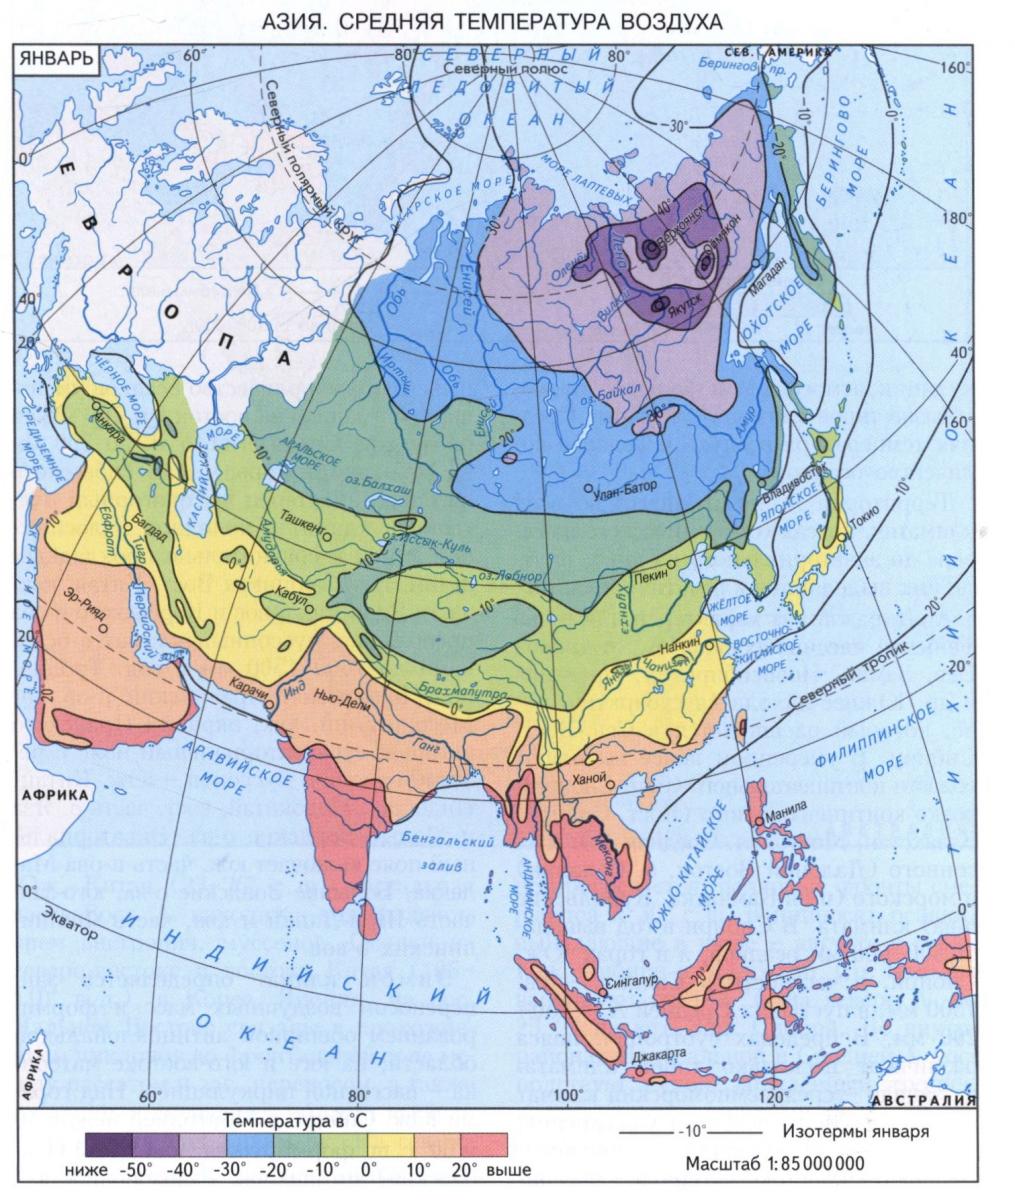 Ср темп-ра воздуха в Азии